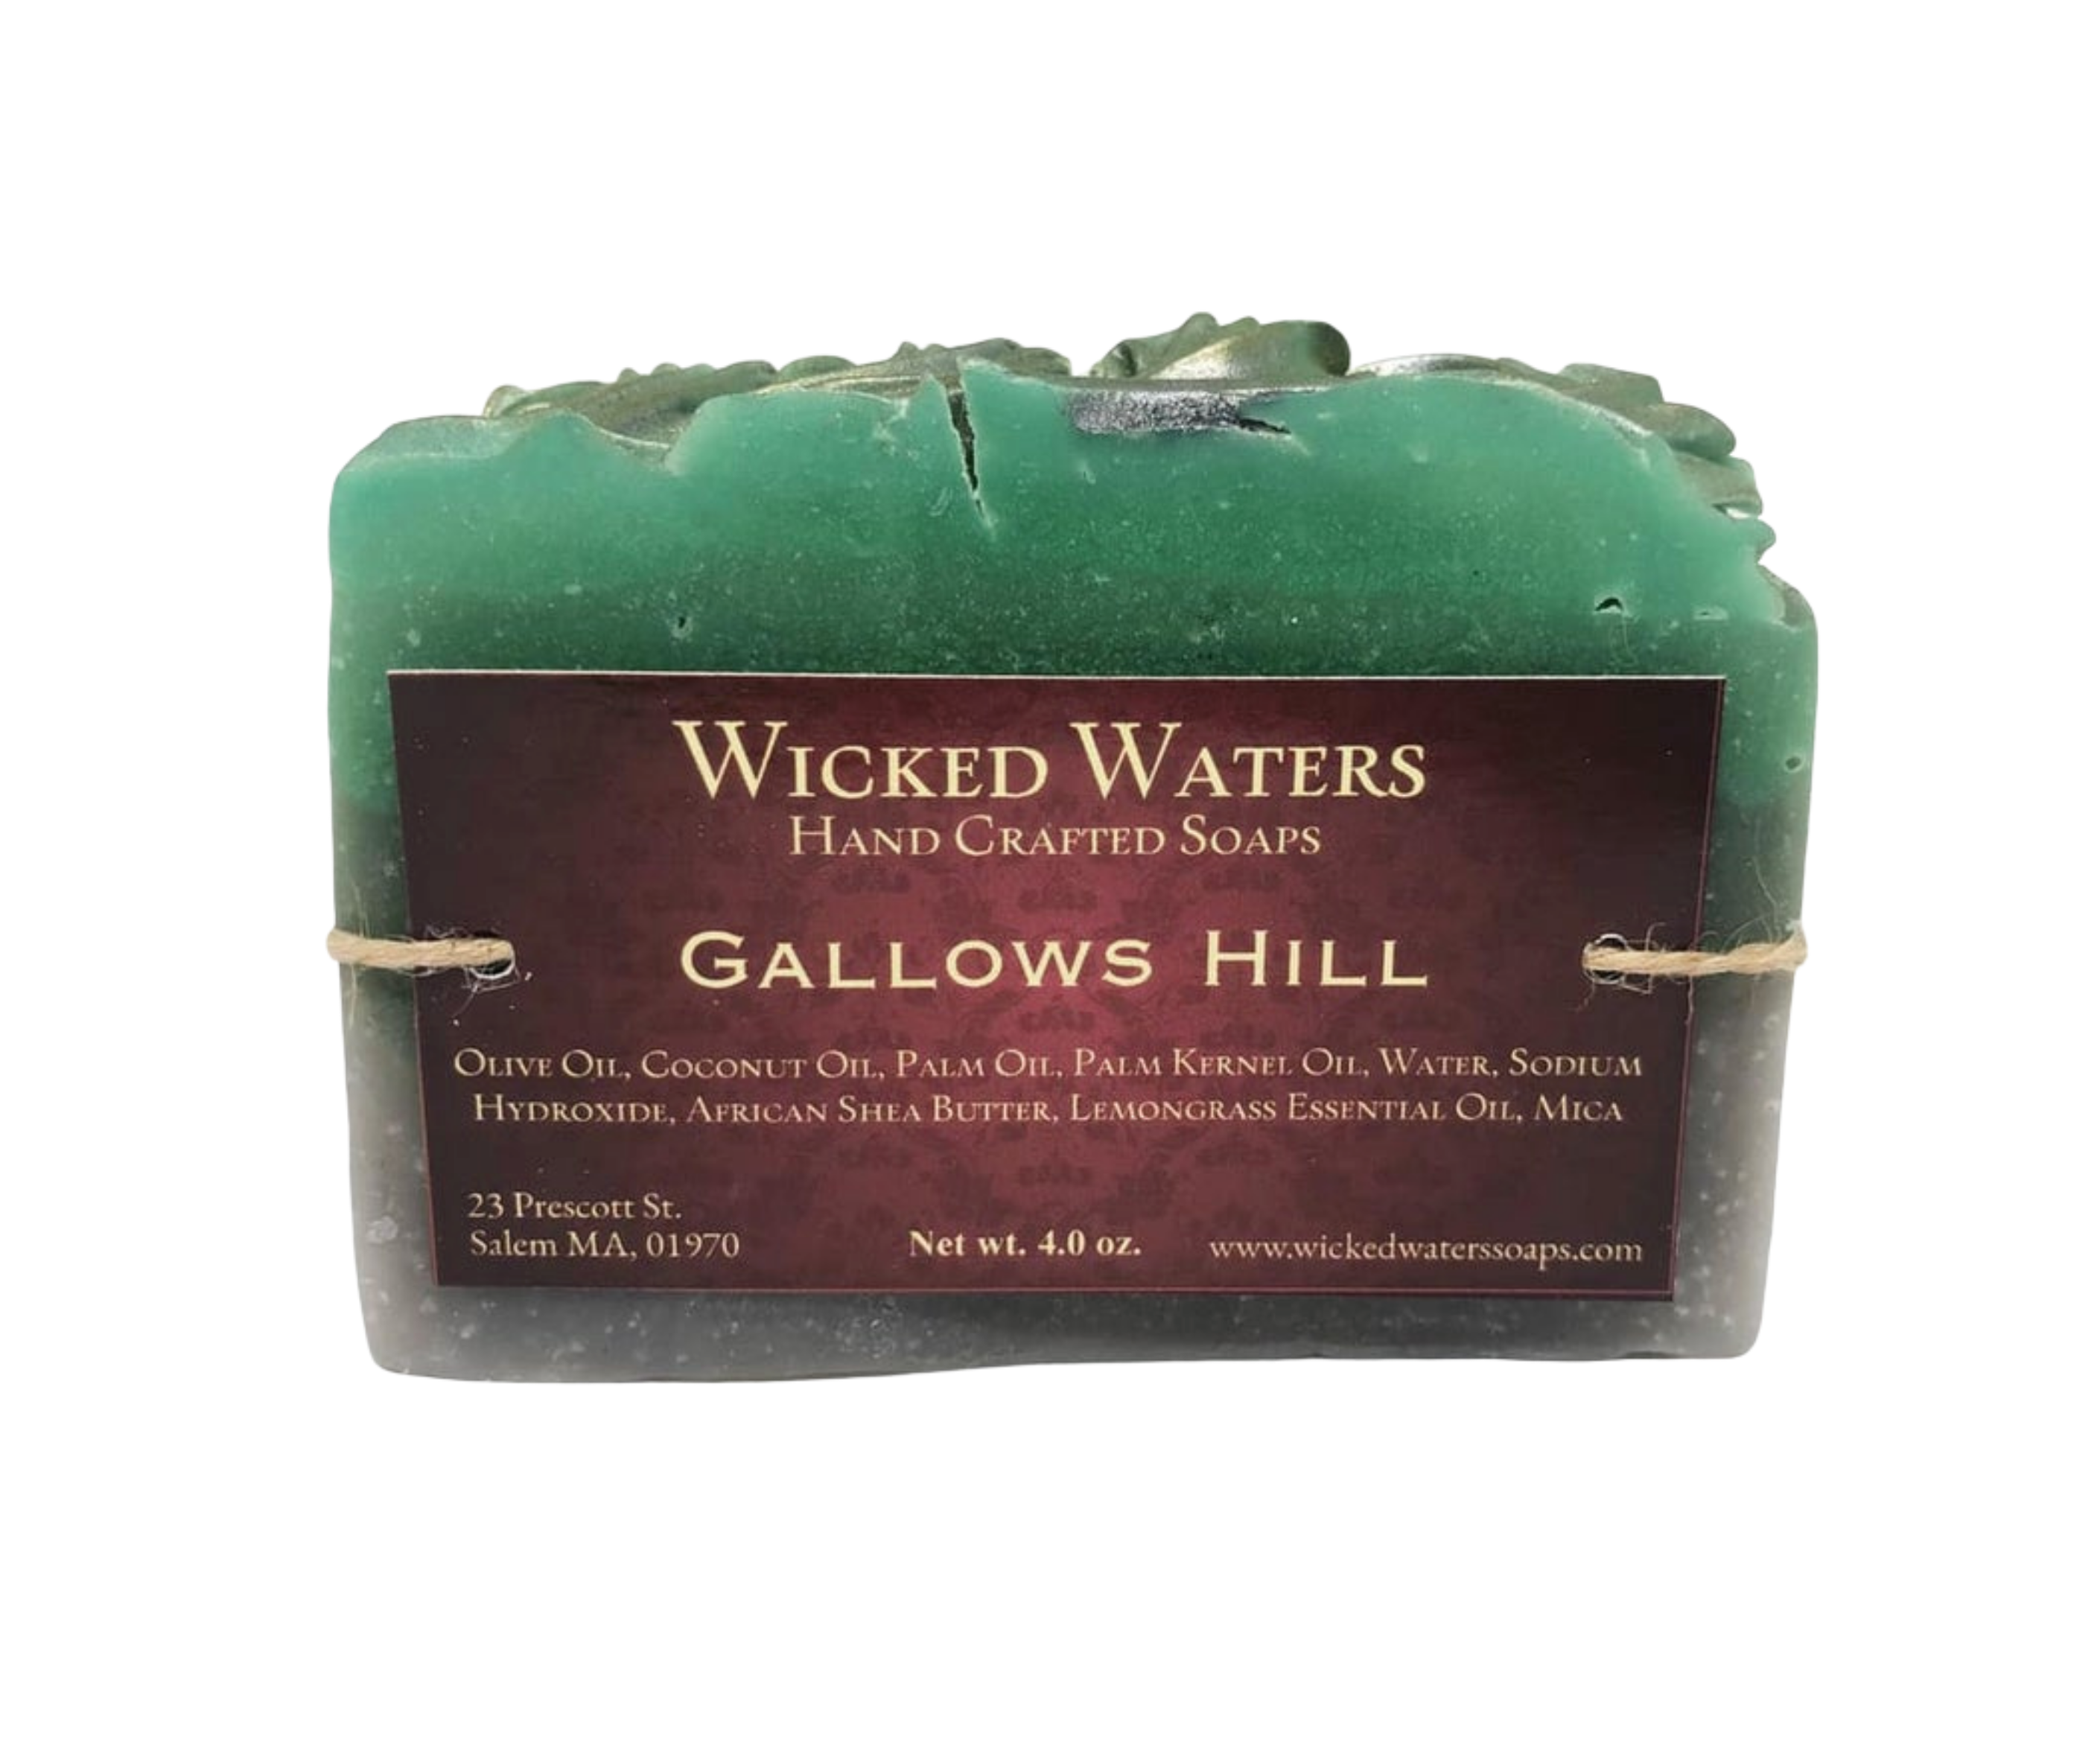 Gallows Hill 2820 X 2364